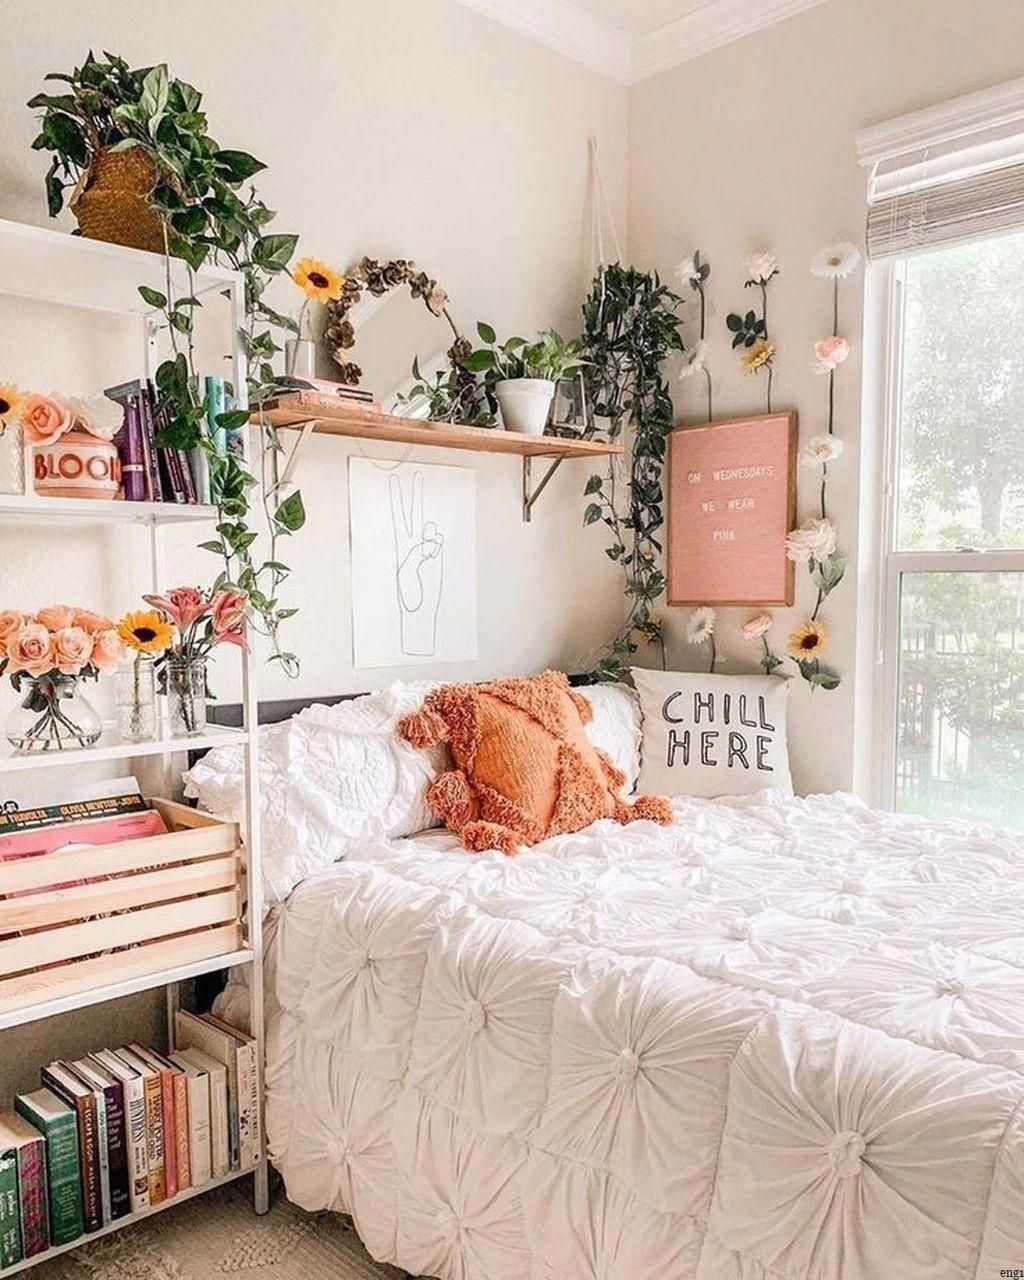 38 Bohemian Bedroom Decor Ideas Bedroom inspo